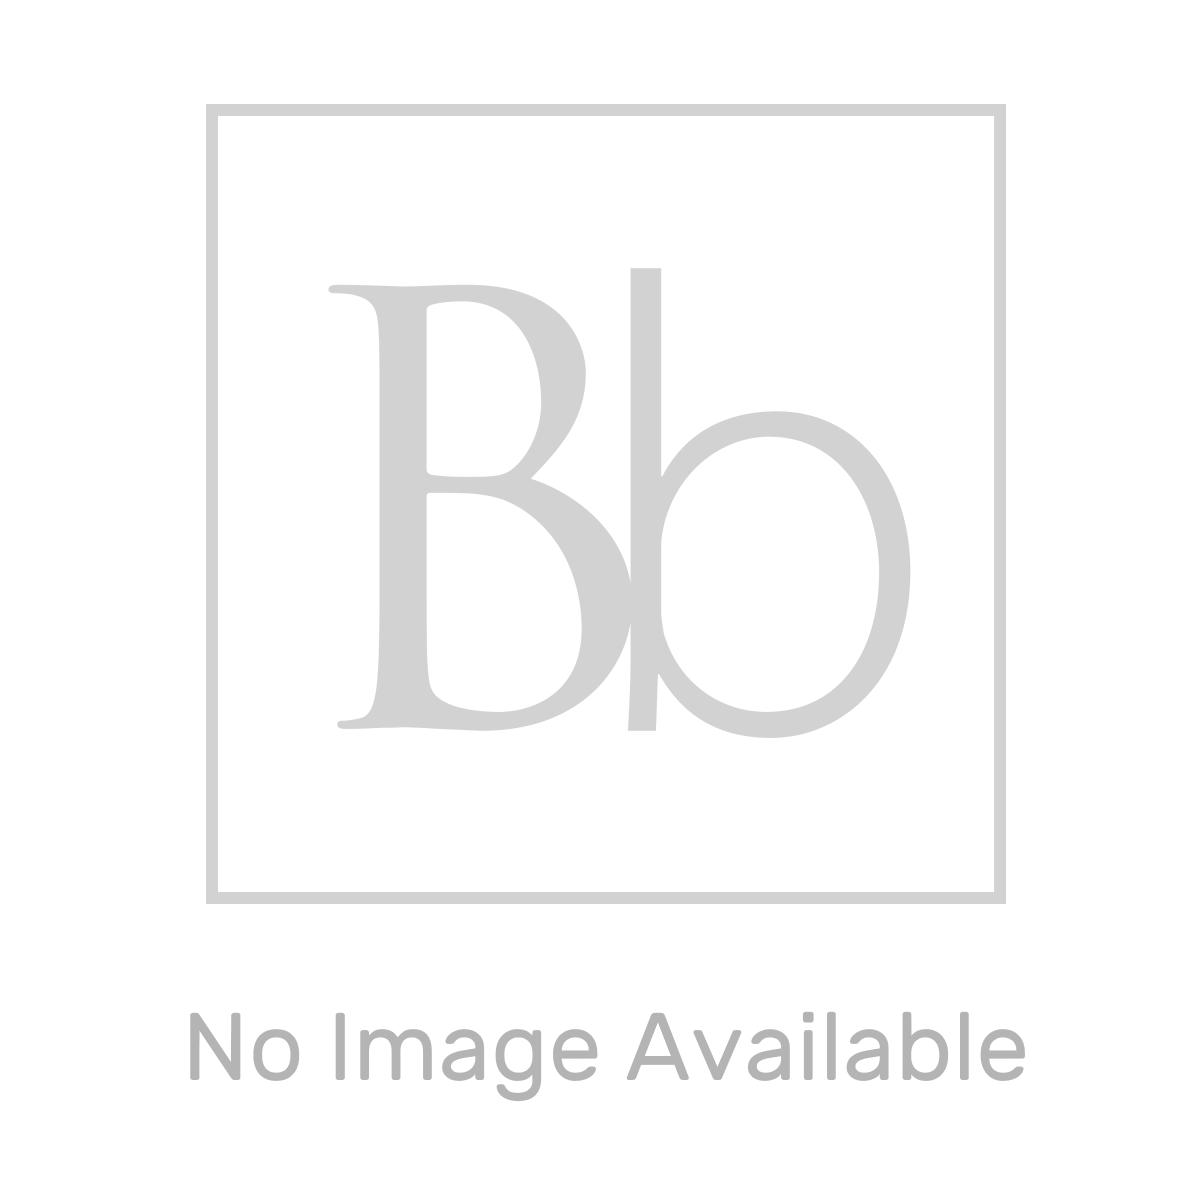 RAK Series 600 Bath Shower Mixer Tap